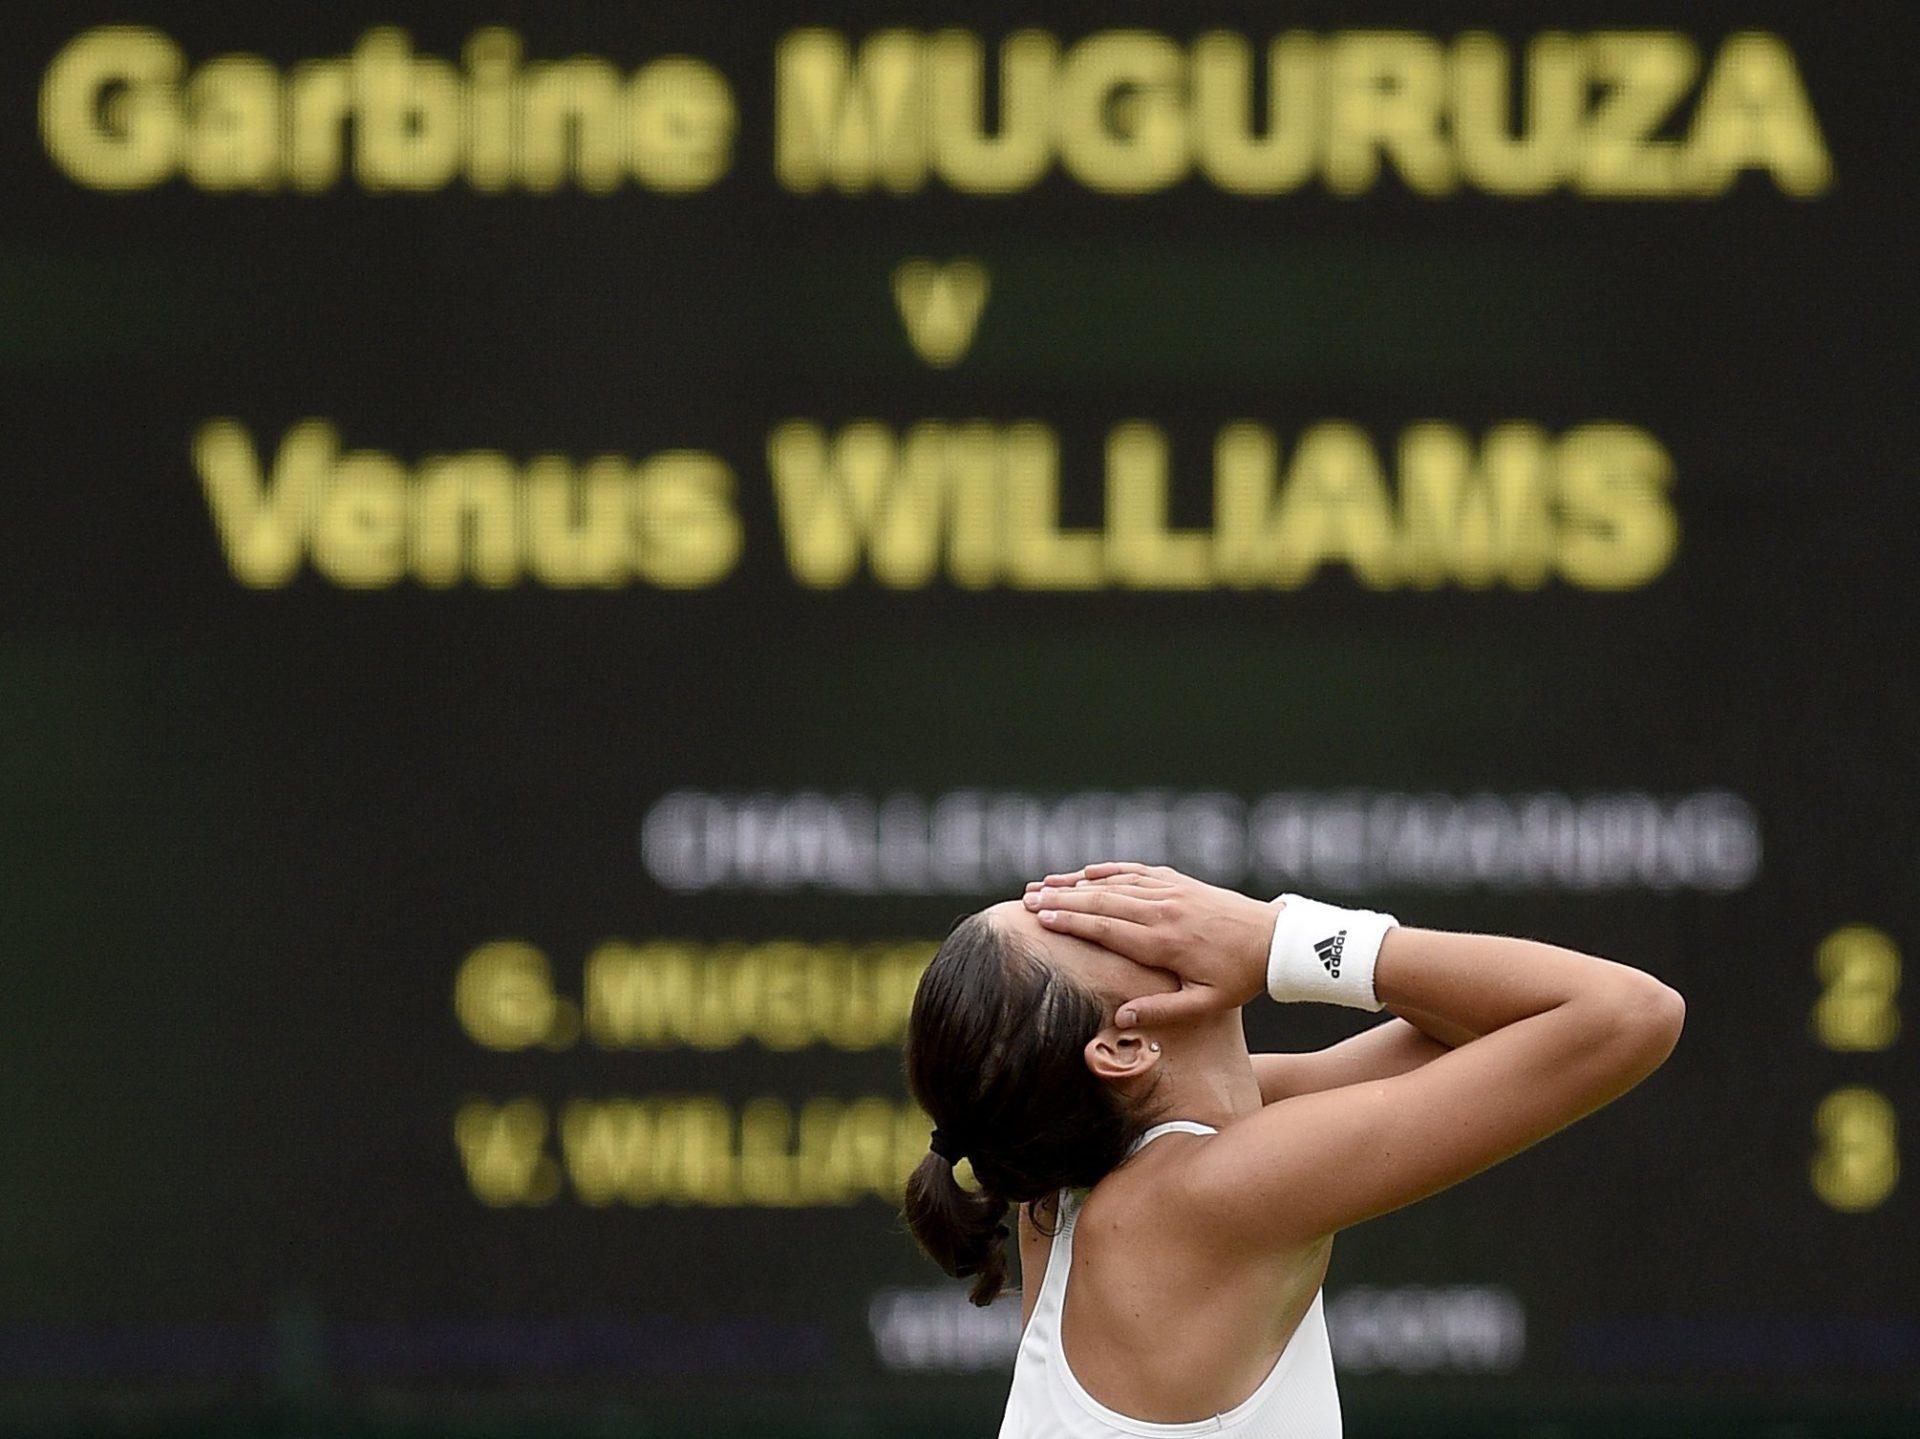 El ojo de halcón confirma la victoria de la Garbiñe Muguruza en Wimbledon